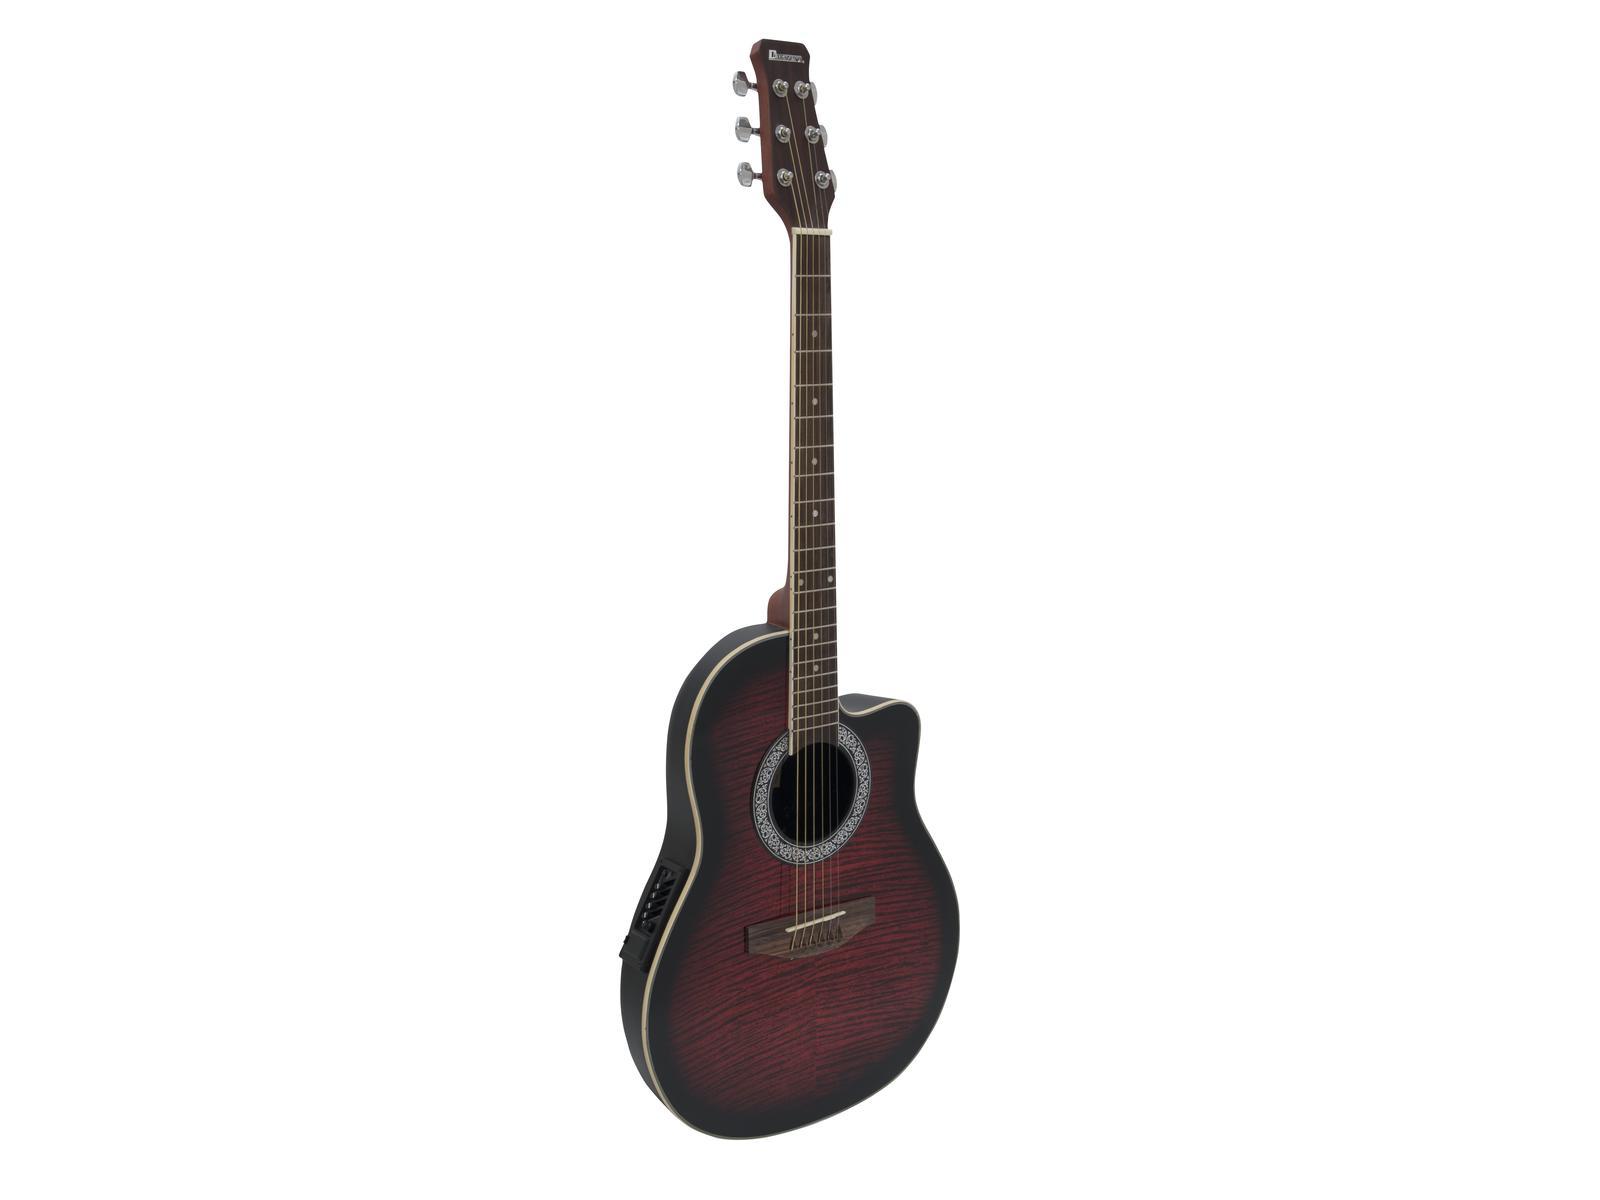 Dimavery RB-300, elektroakustická kytara typu Ovation, stínovaná červená